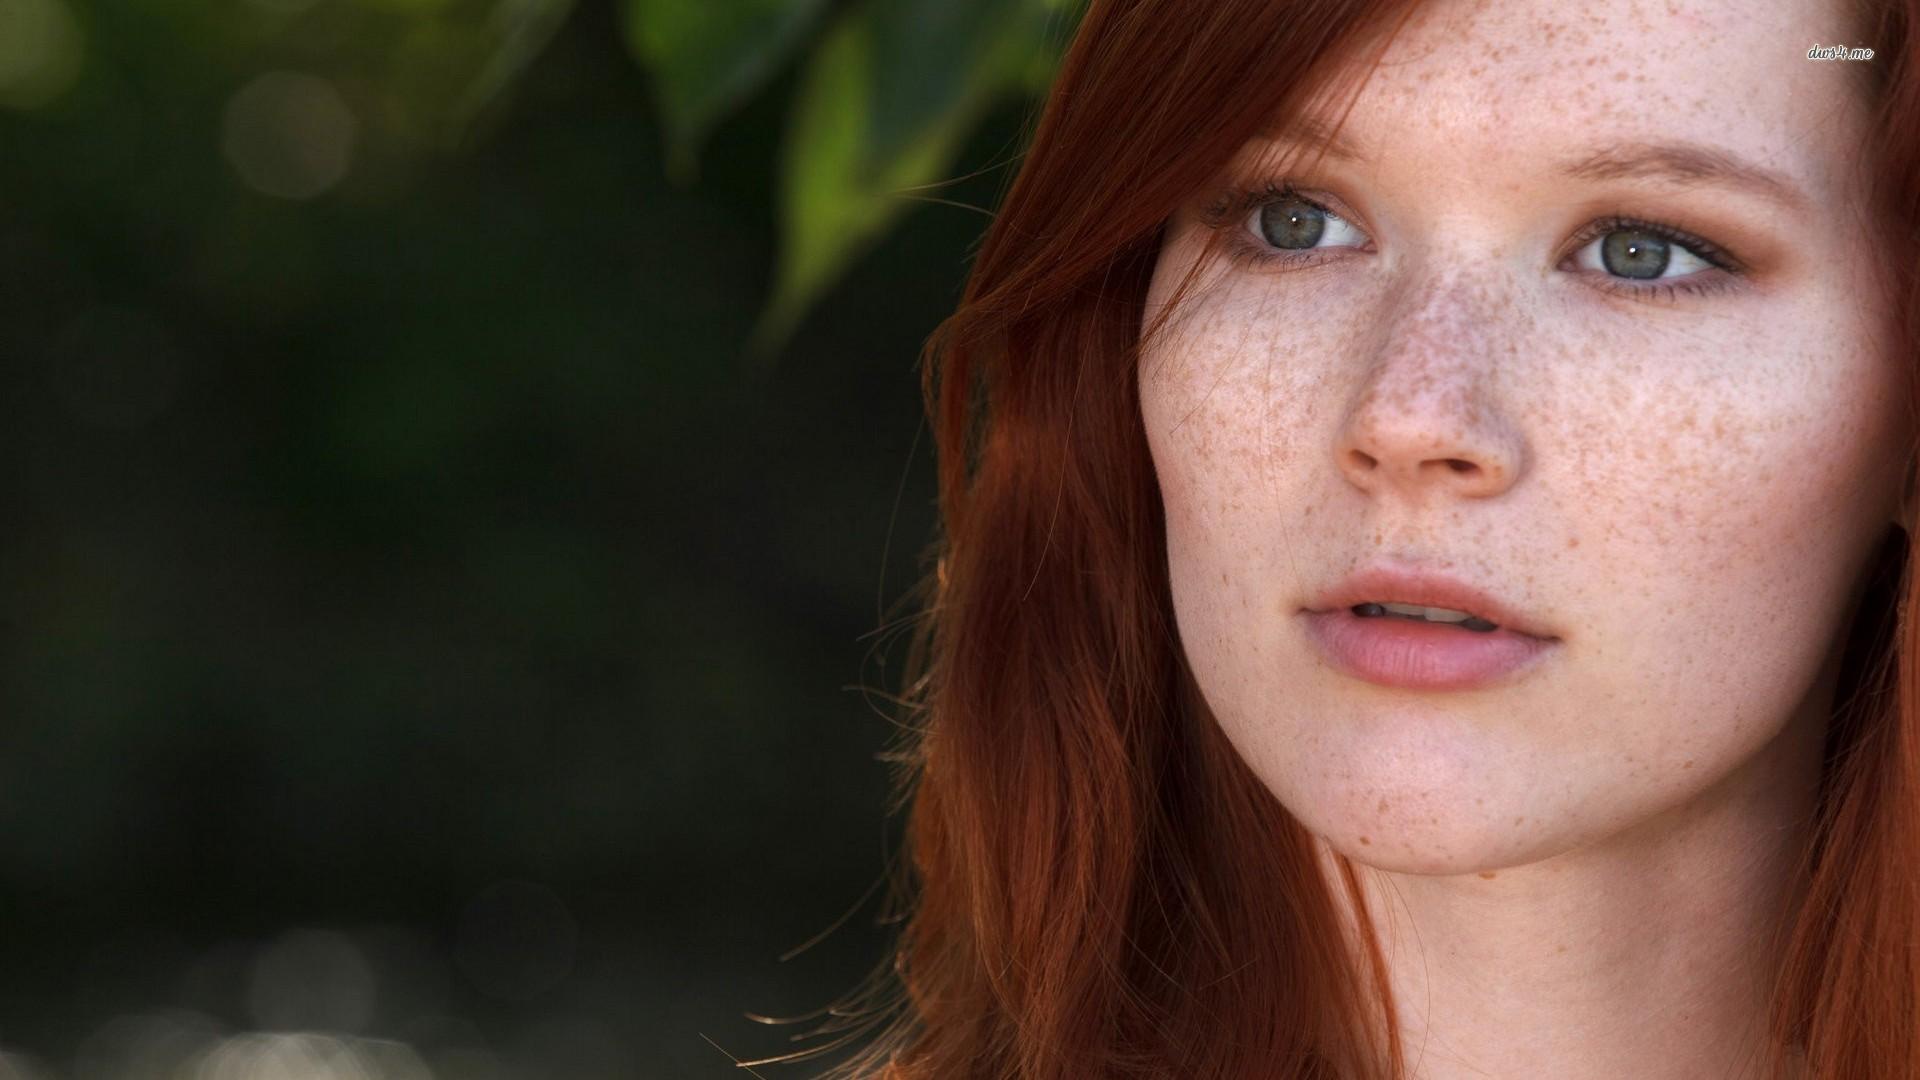 freckles women